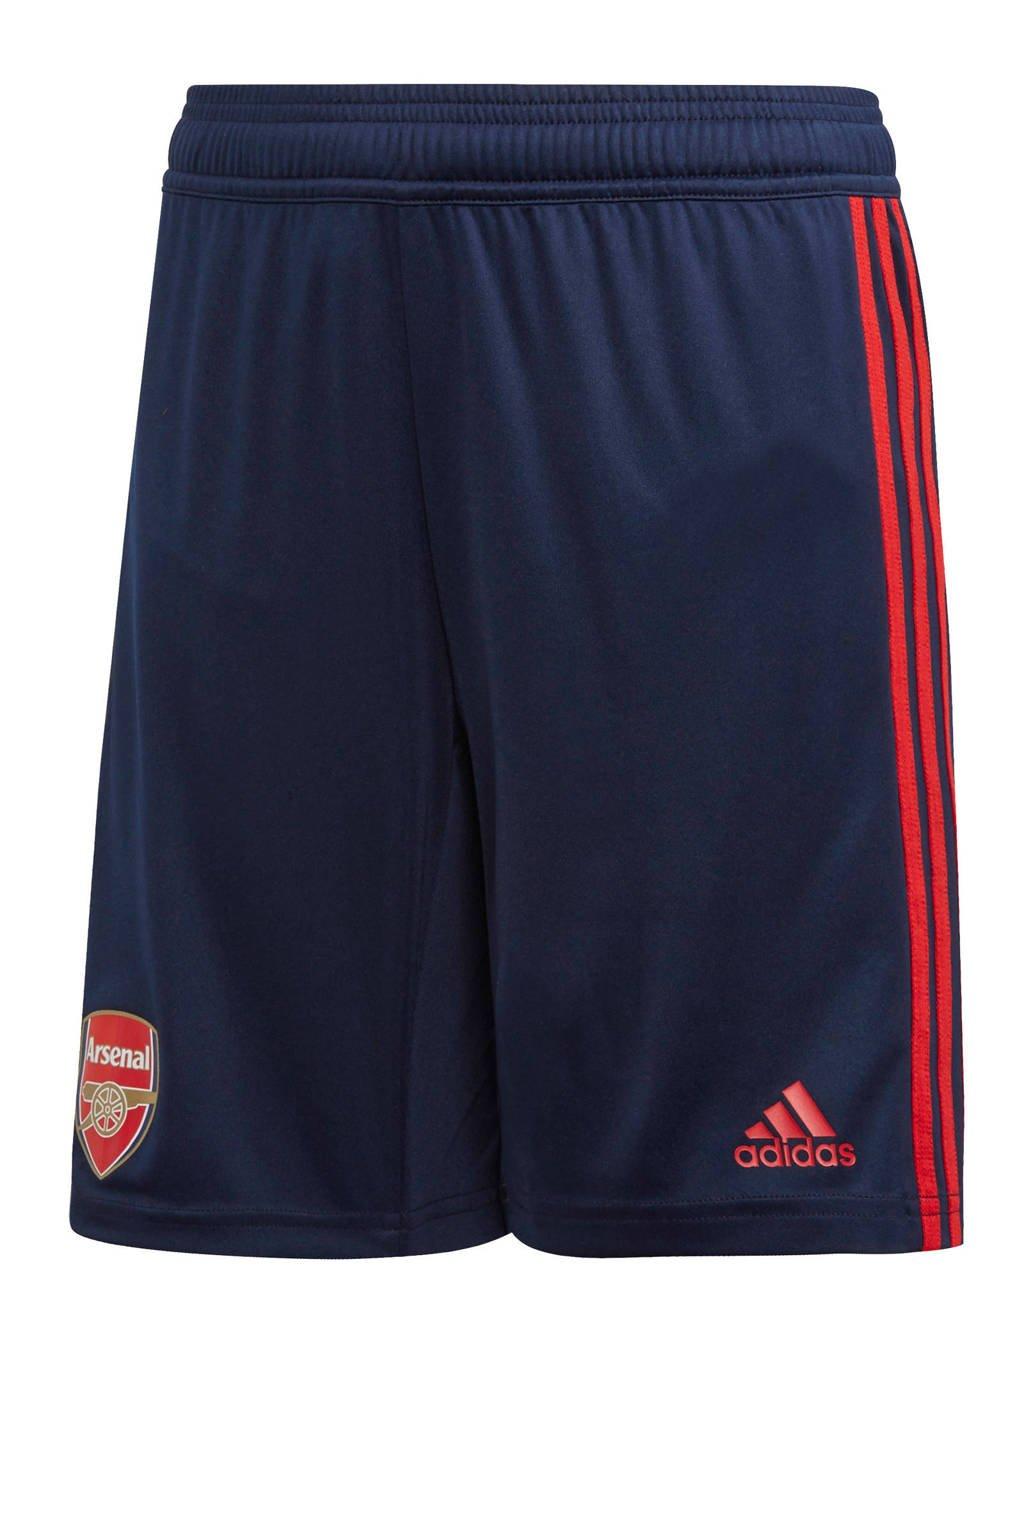 adidas performance Junior Arsenal FC voetbalshort, Donkerblauw/rood